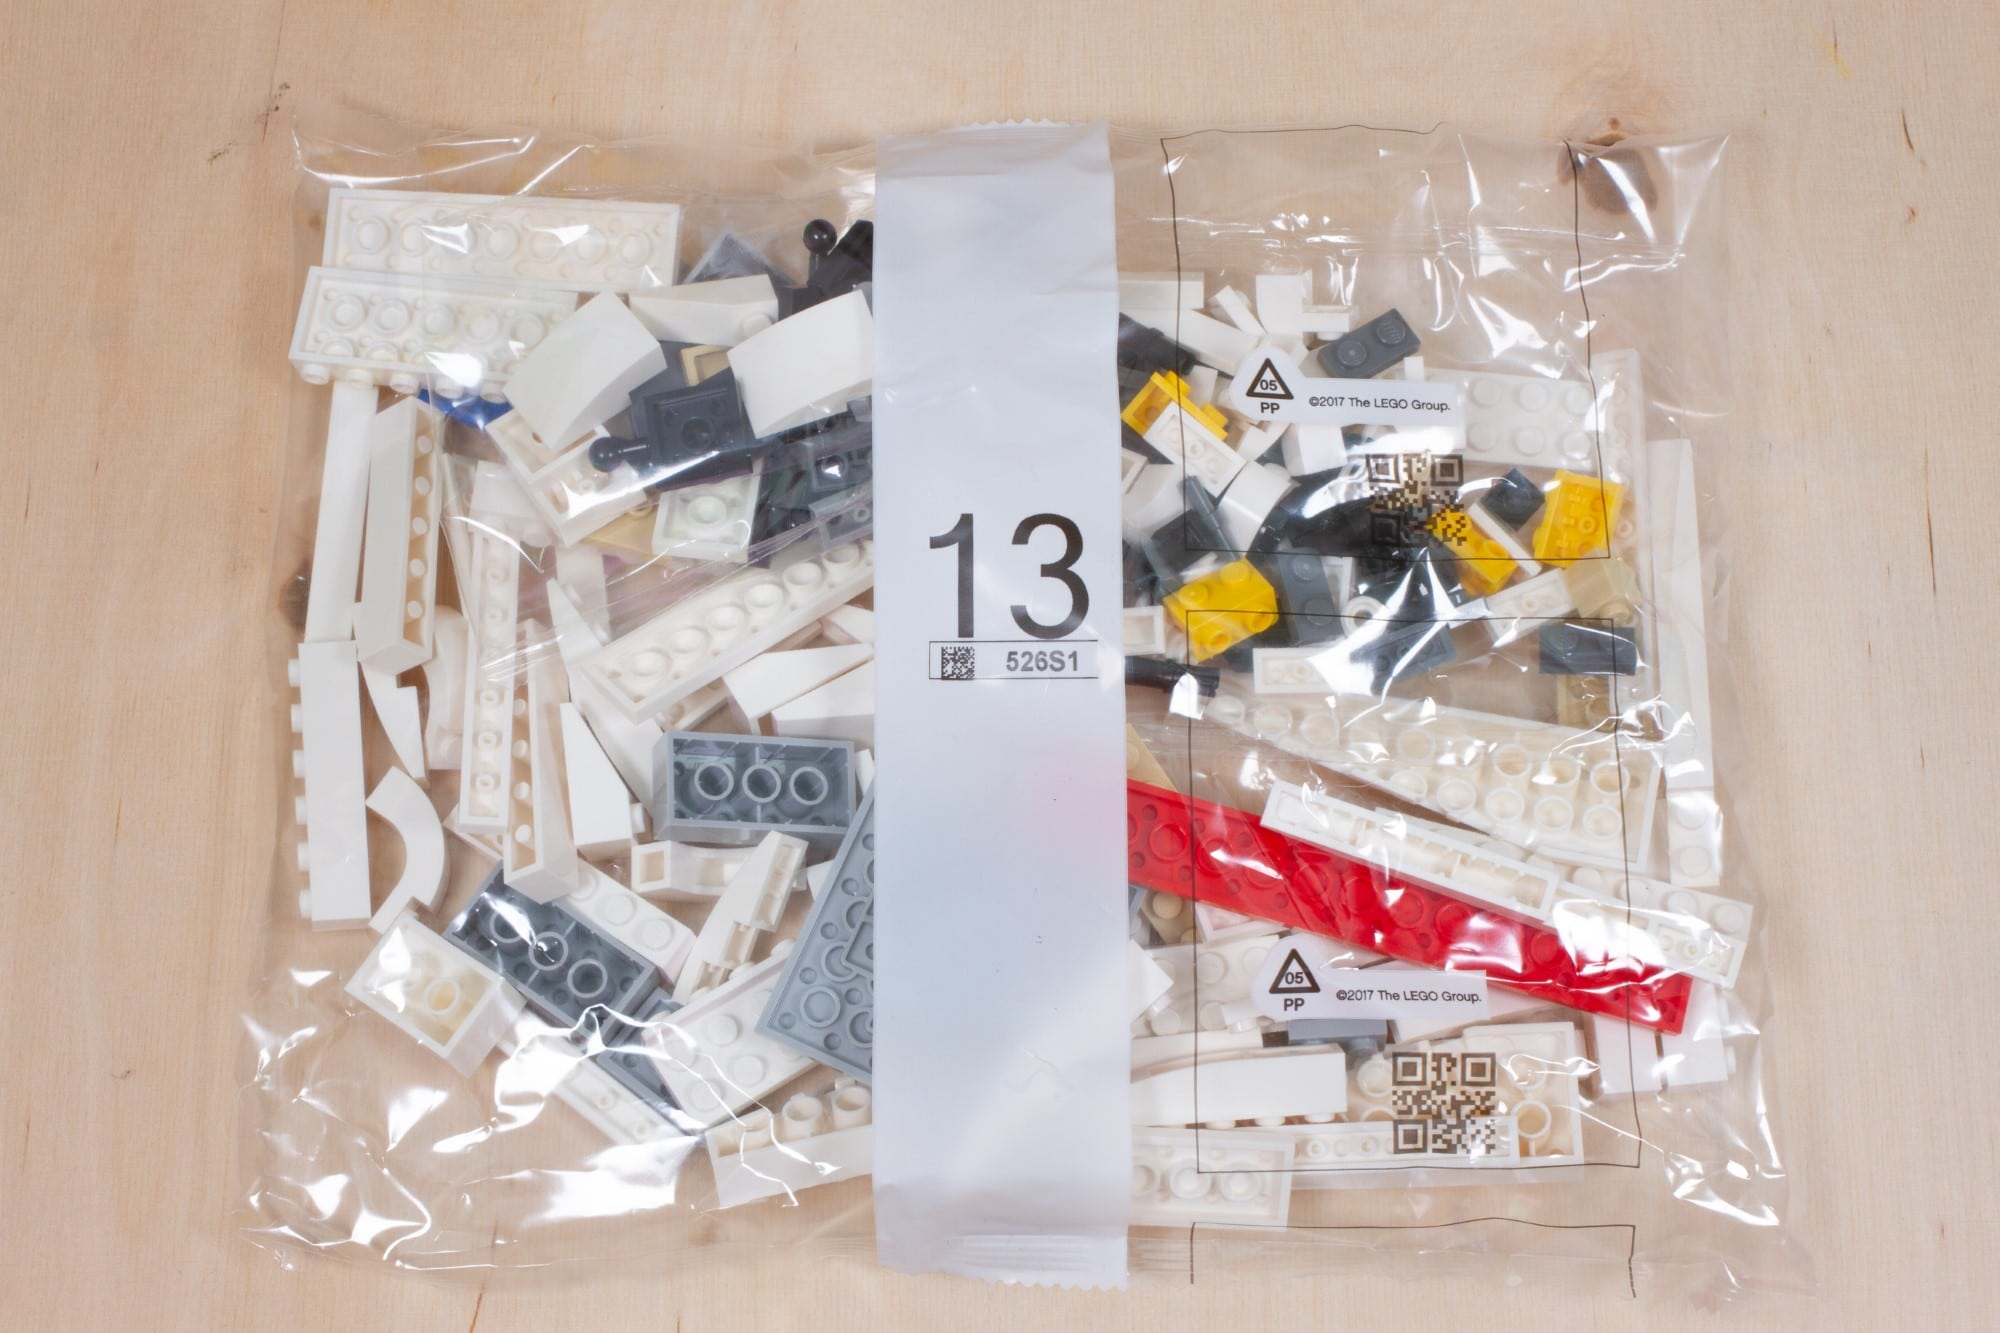 LEGO 76391 Hogwarts Icons Review Unboxing 2 Schritt 13